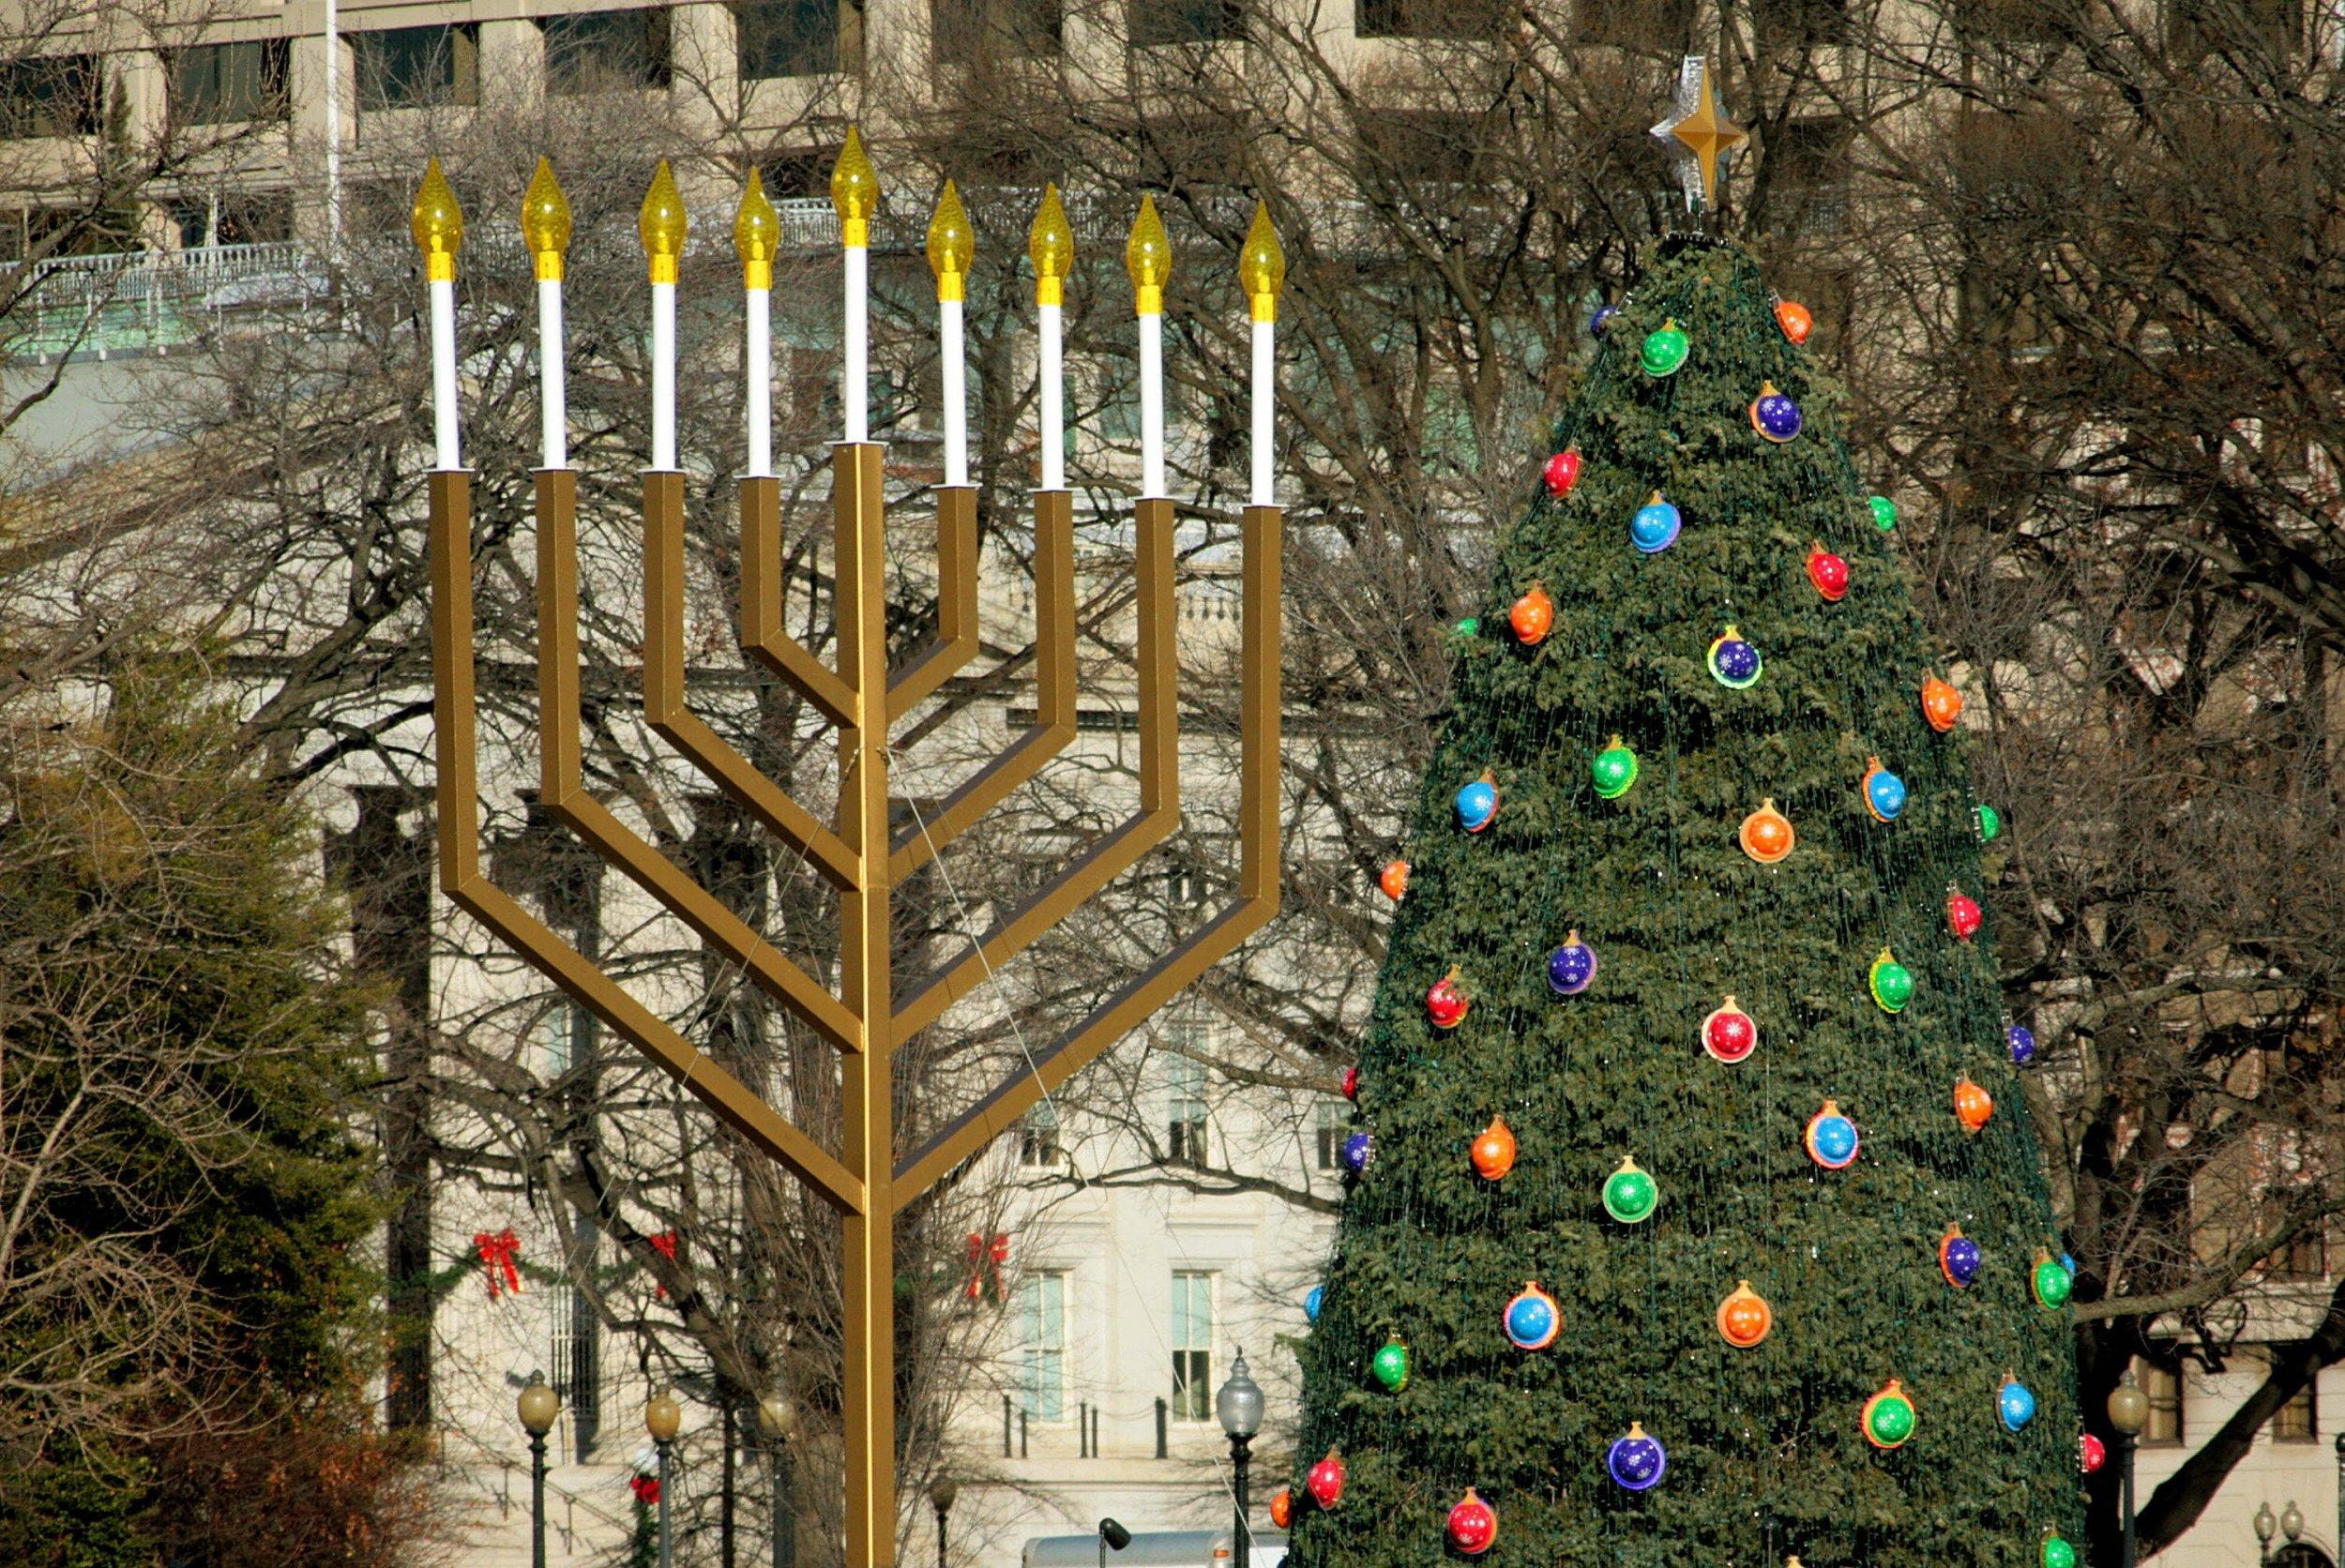 Christmas Hanukkah Kwanzaa And Other Holidays.When Do All The December Holidays Start Kwanzaa Christmas